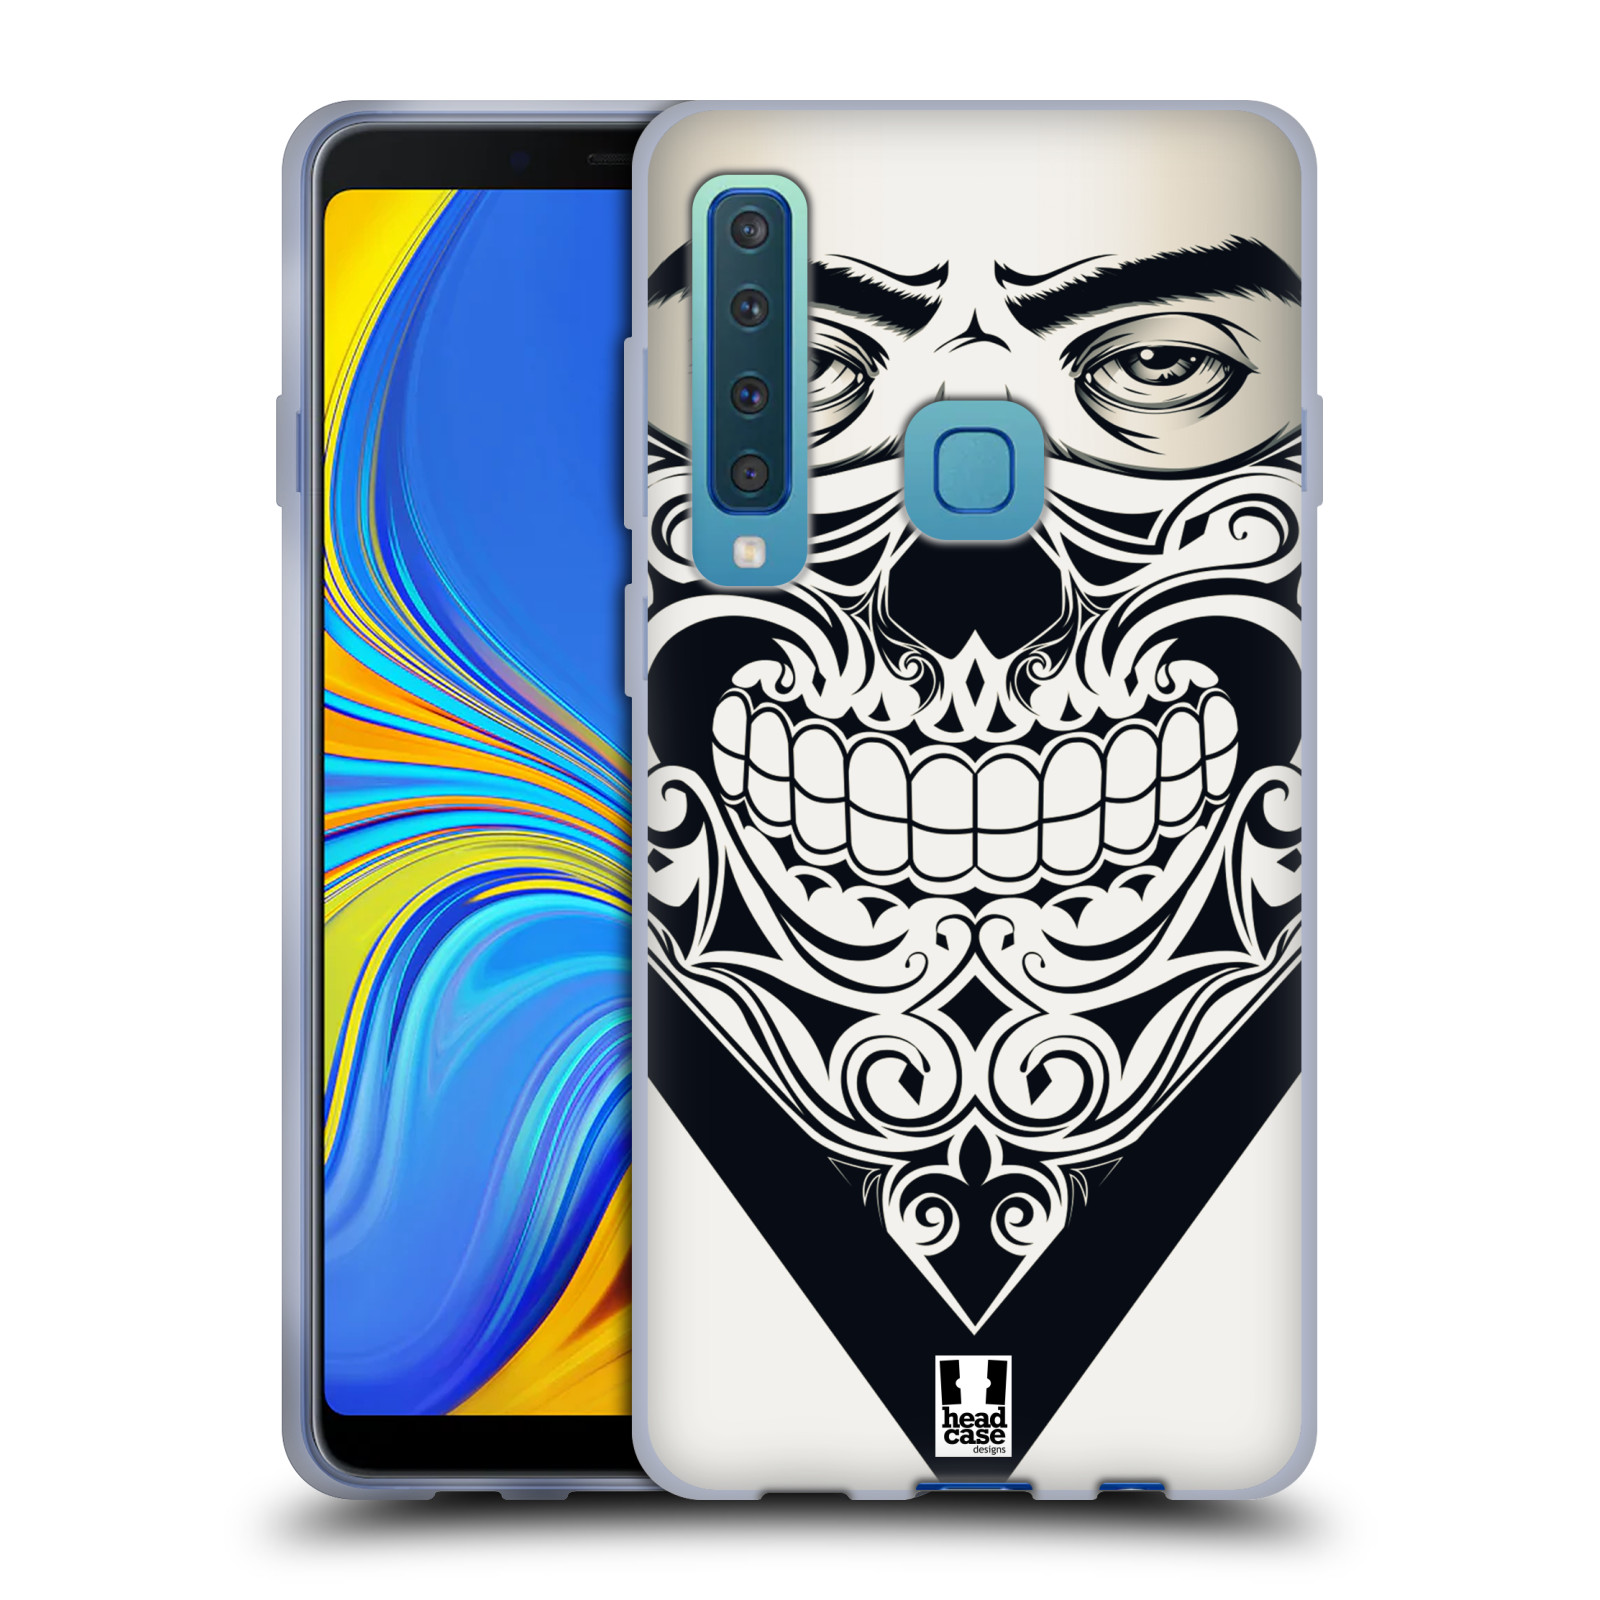 Silikonové pouzdro na mobil Samsung Galaxy A9 (2018) - Head Case - LEBKA BANDANA